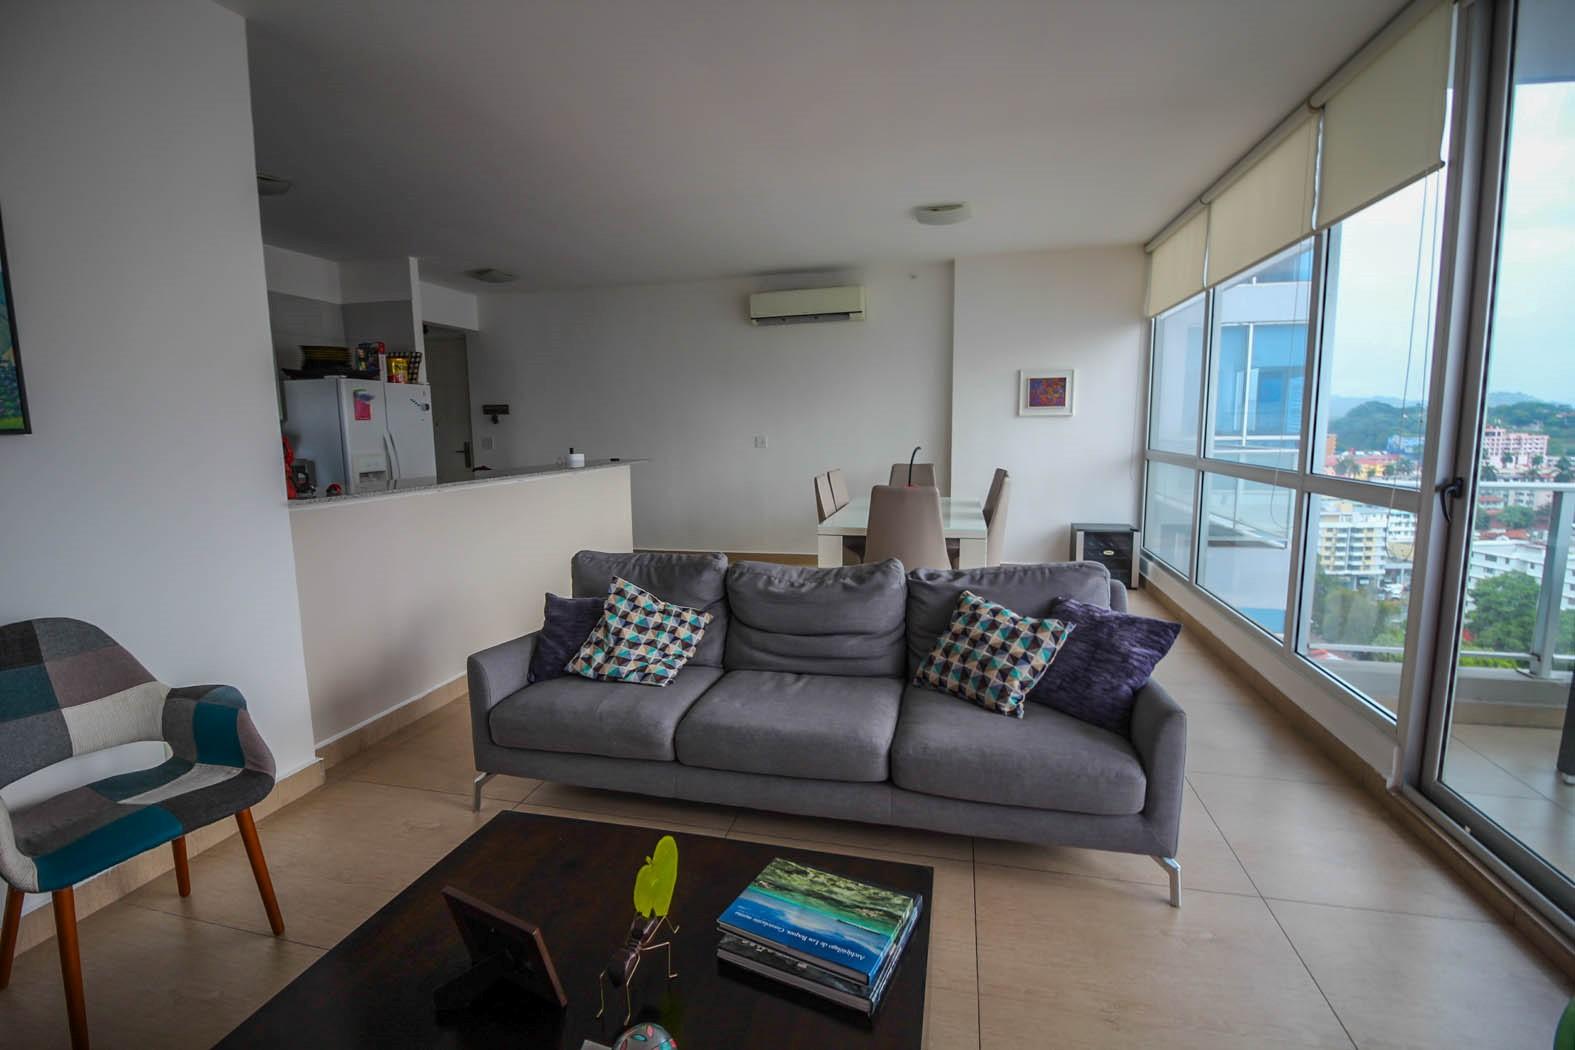 Avenida-Balboa-Panama-property-panamaequityocean-city-views-2nd-line-balboa-ave-5.jpg